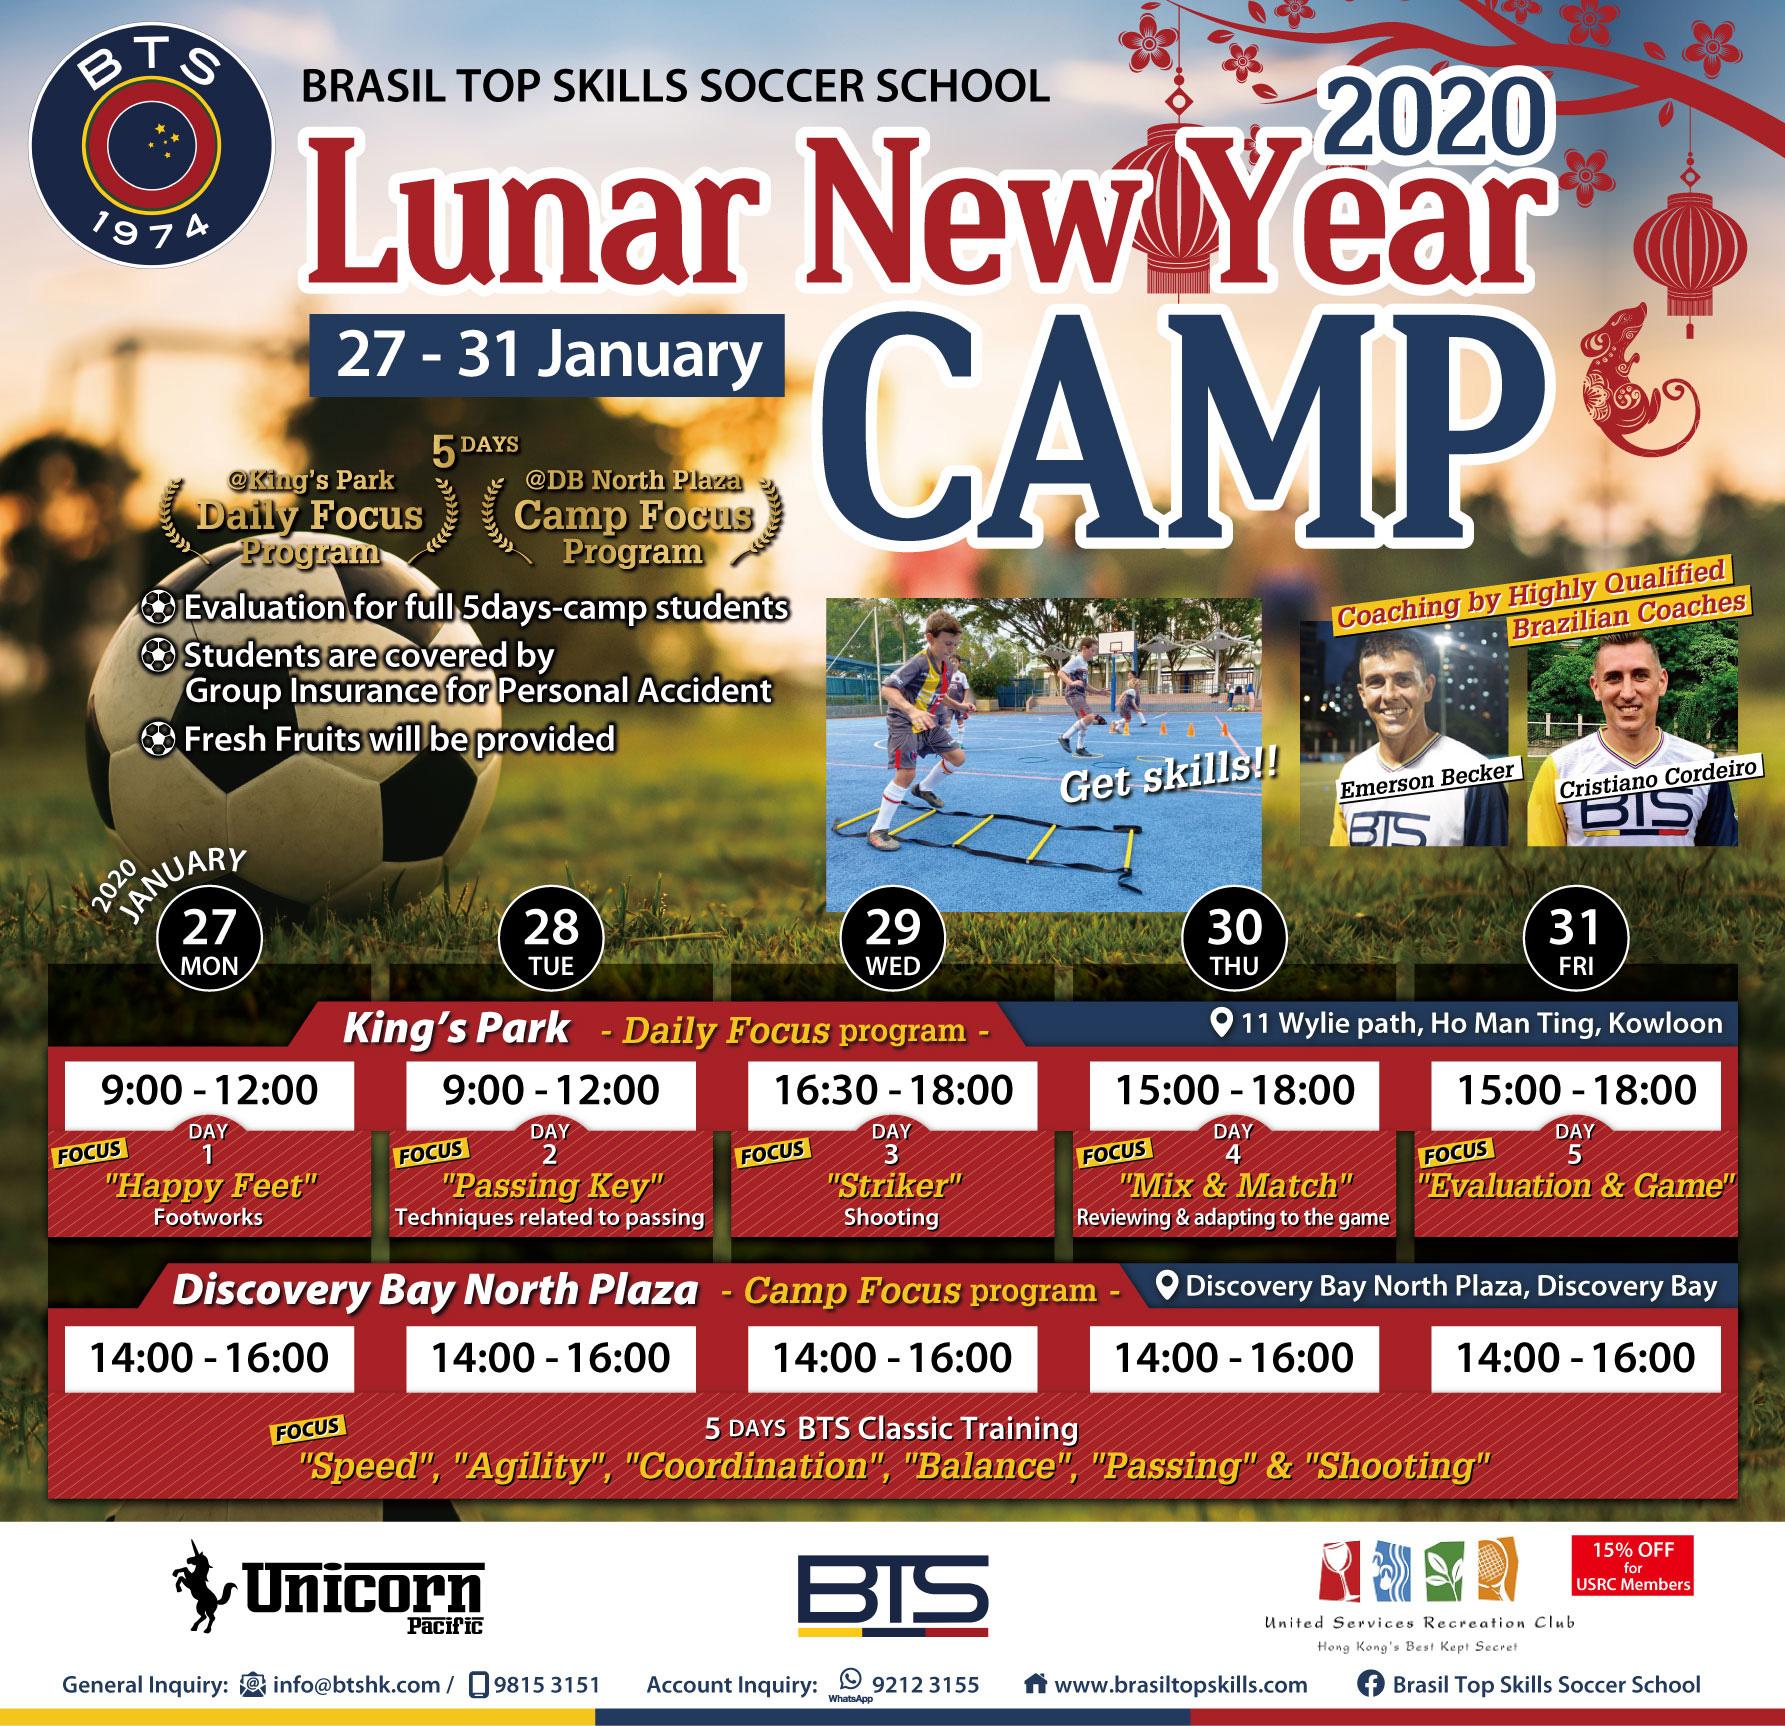 2020 CNY Camp schedule